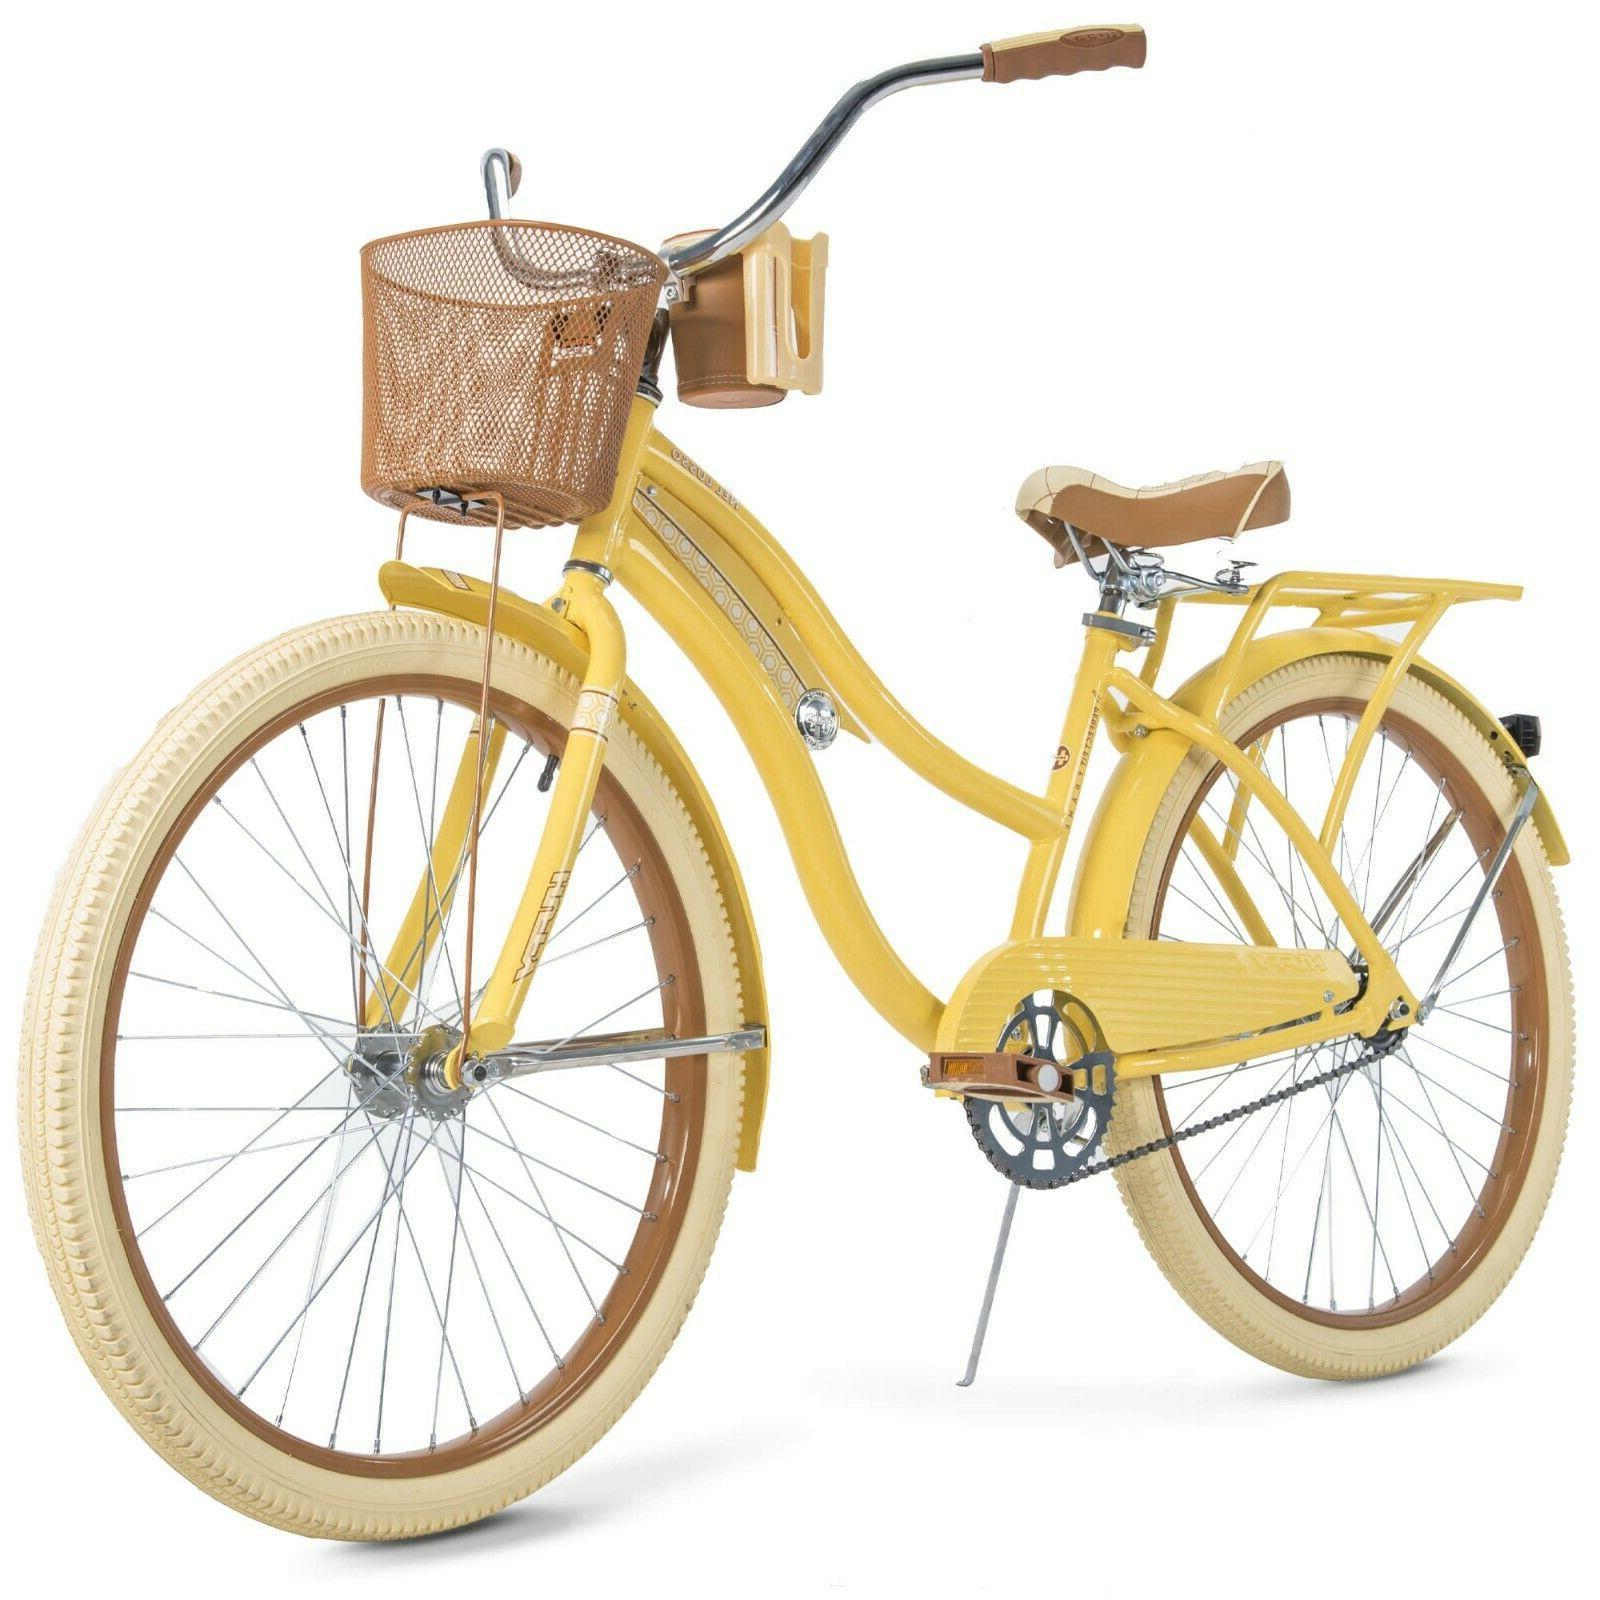 Huffy Nel Lusso 26 inch Cruiser Bike - Yellow